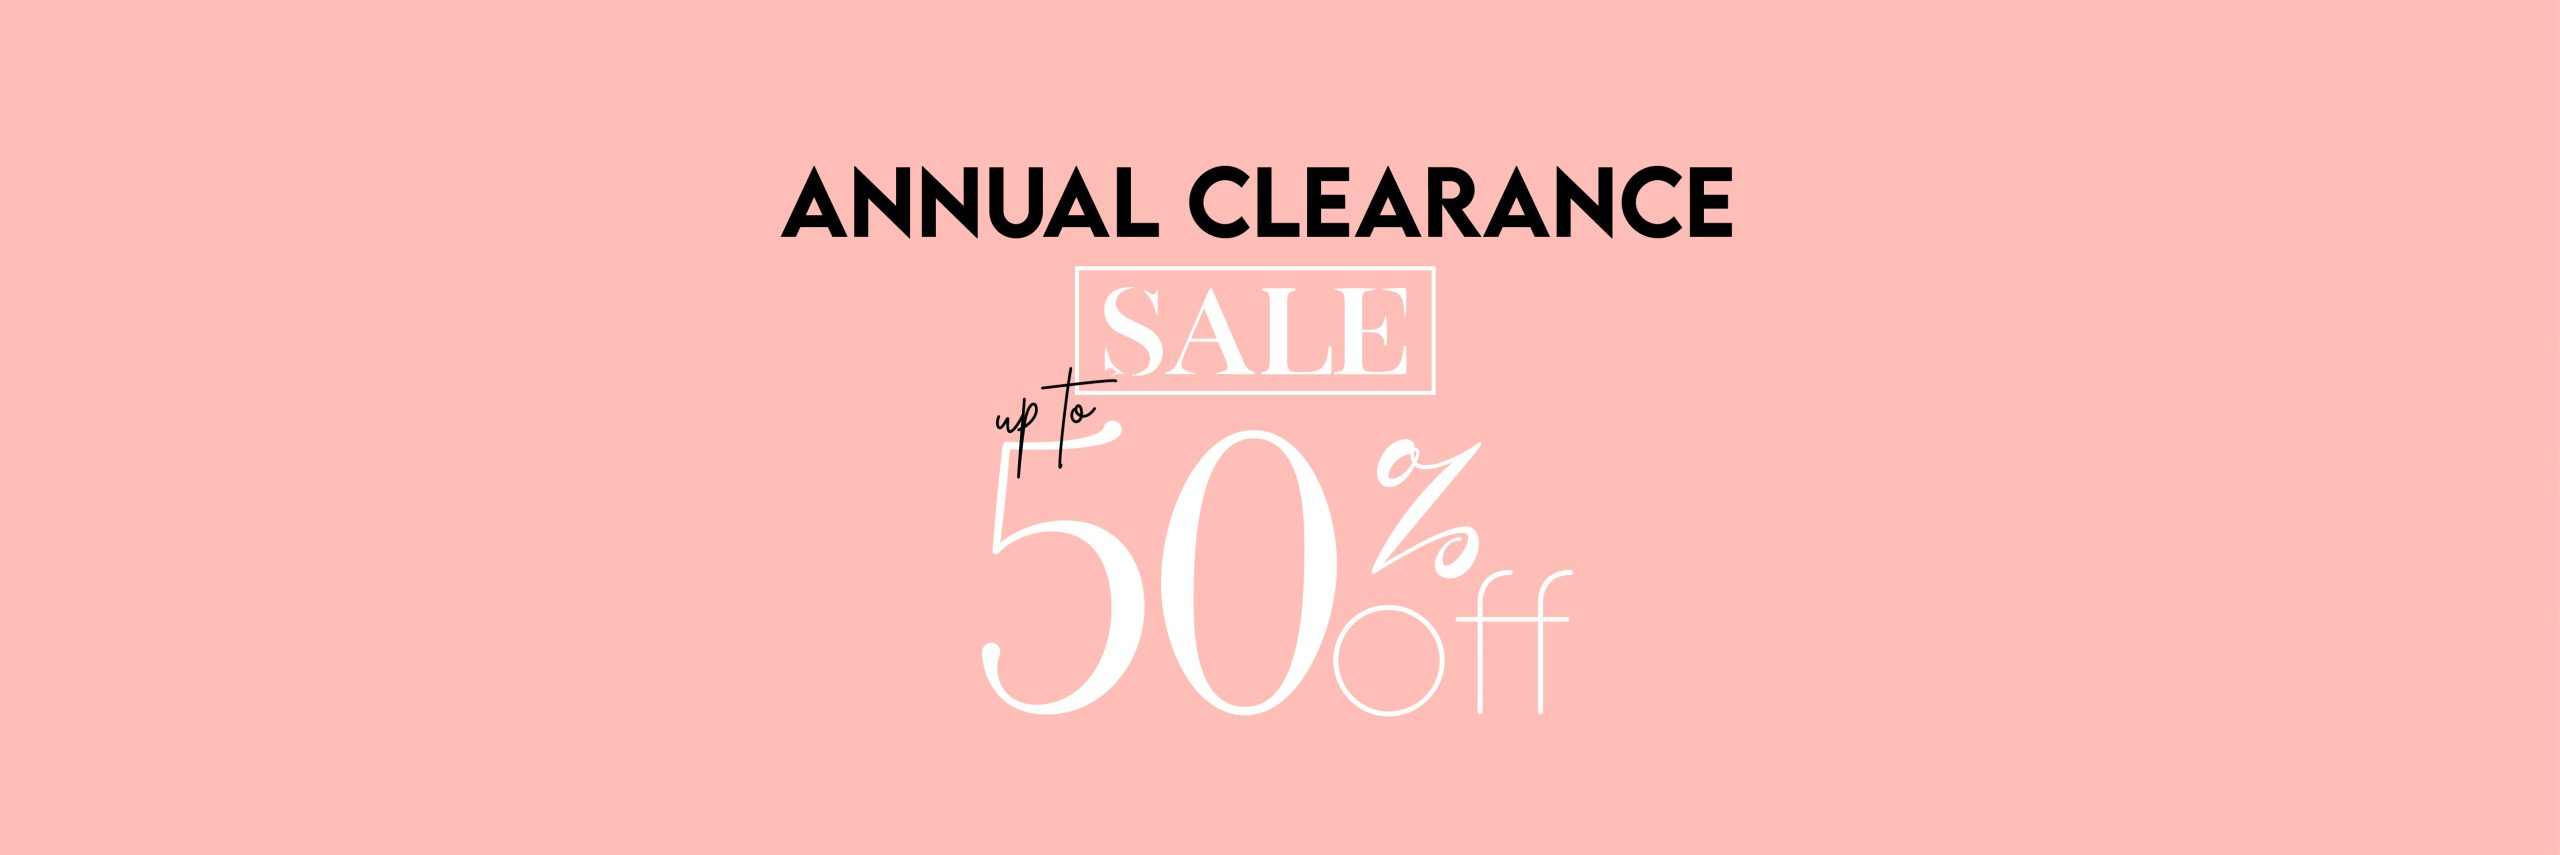 Sifona - Annual Clearance Sale